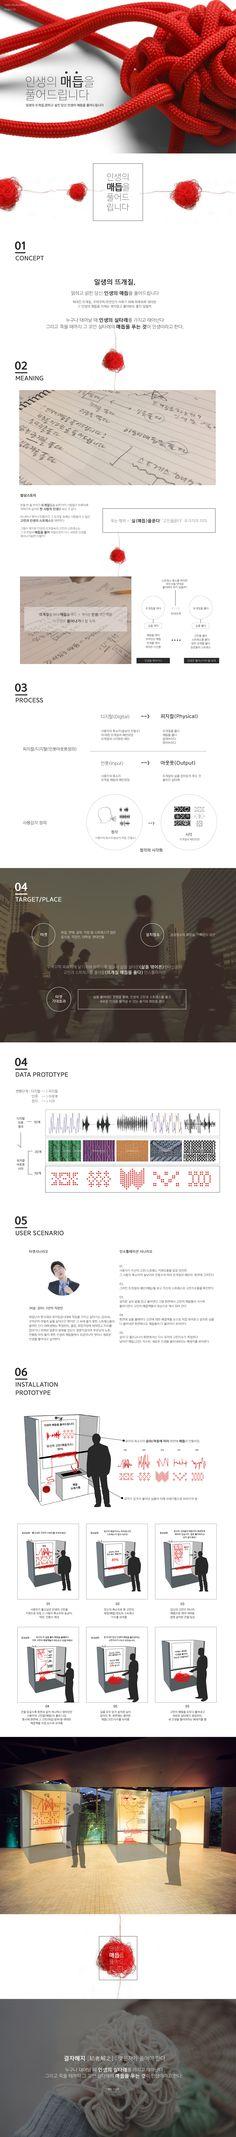 CHAE song mi | TIE, UNTIE LIFE! | Information Visualization 2016│ Major in Digital Media Design │#hicoda │hicoda.hongik.ac.kr